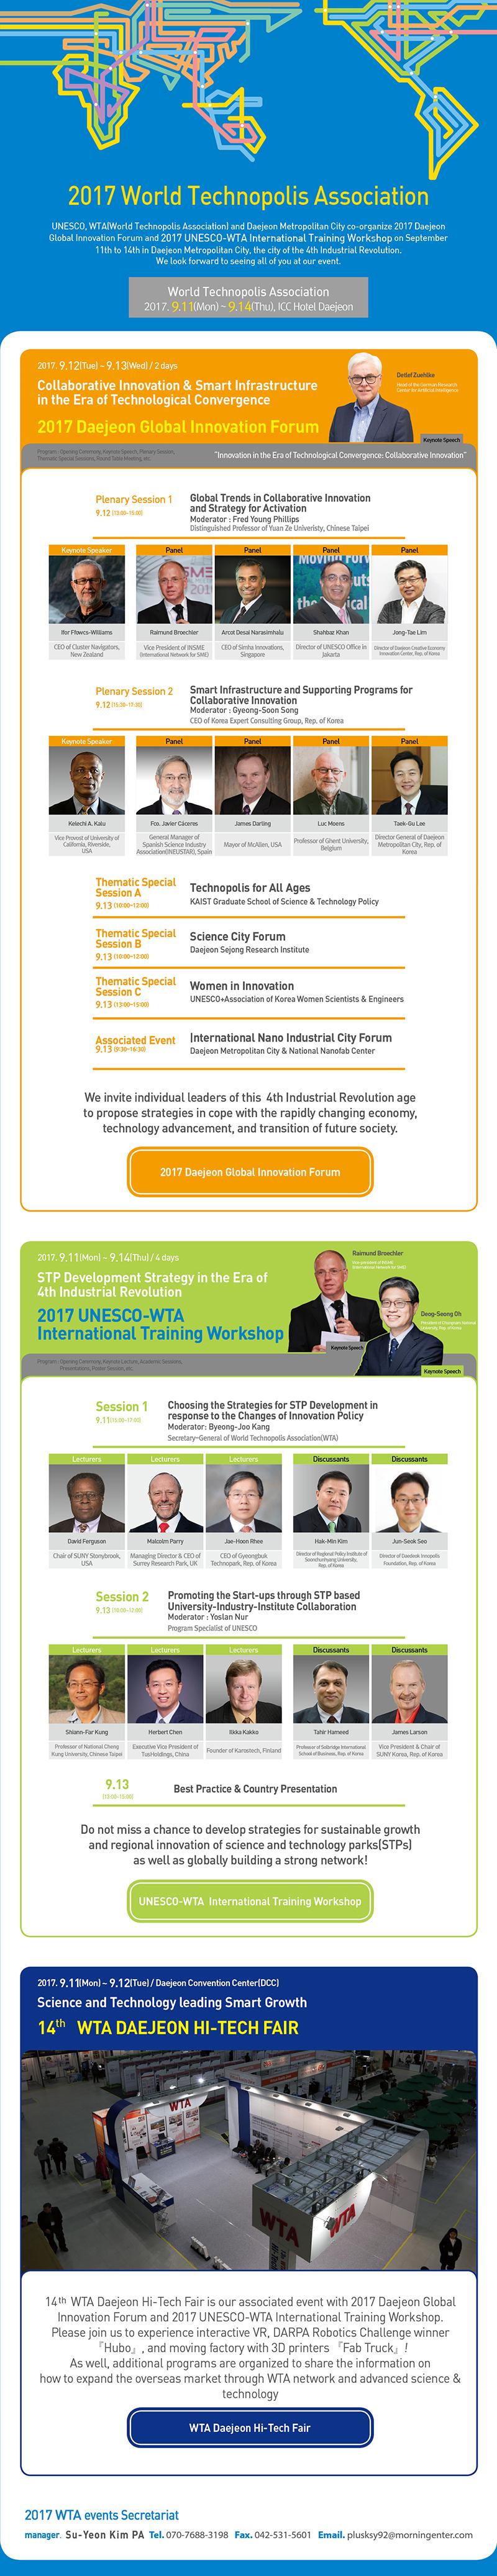 2017 World Technopolis Association